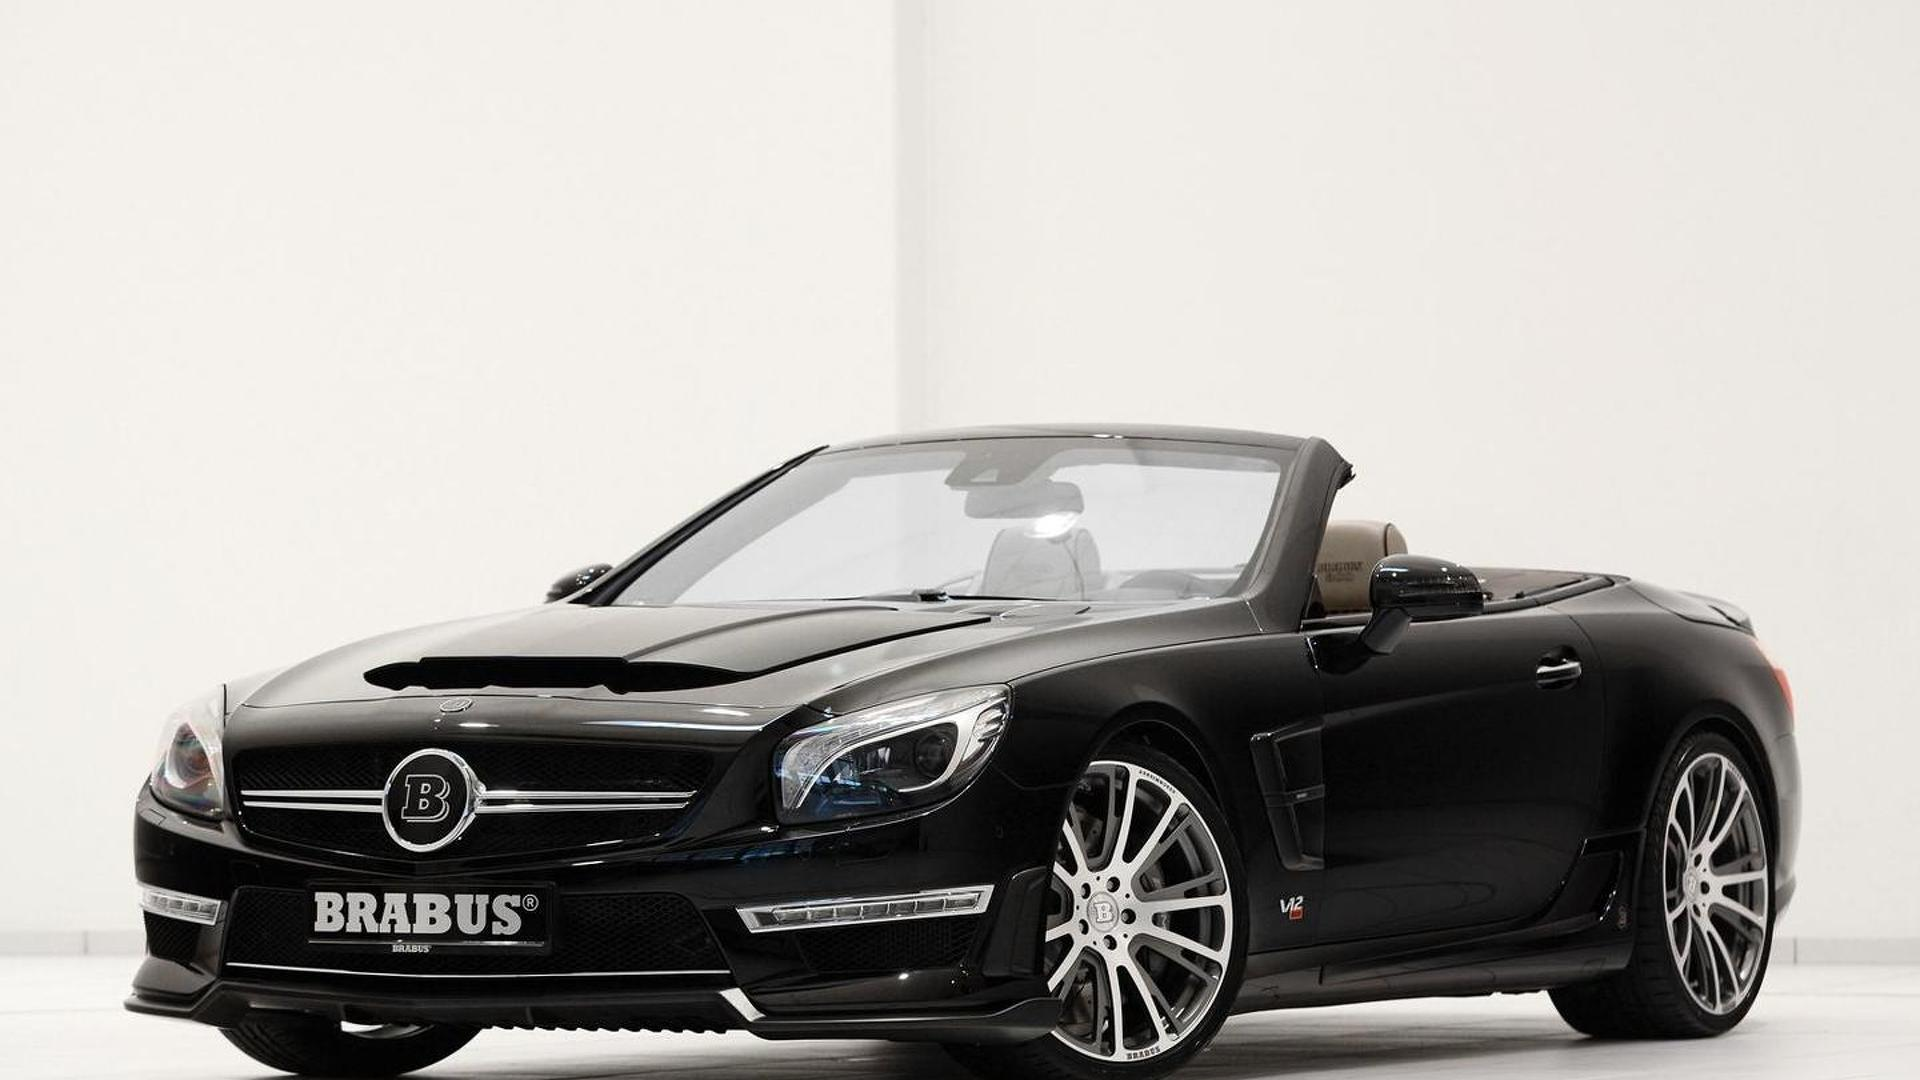 Brabus 800 Roadster based on Mercedes-Benz SL 65 AMG revealed